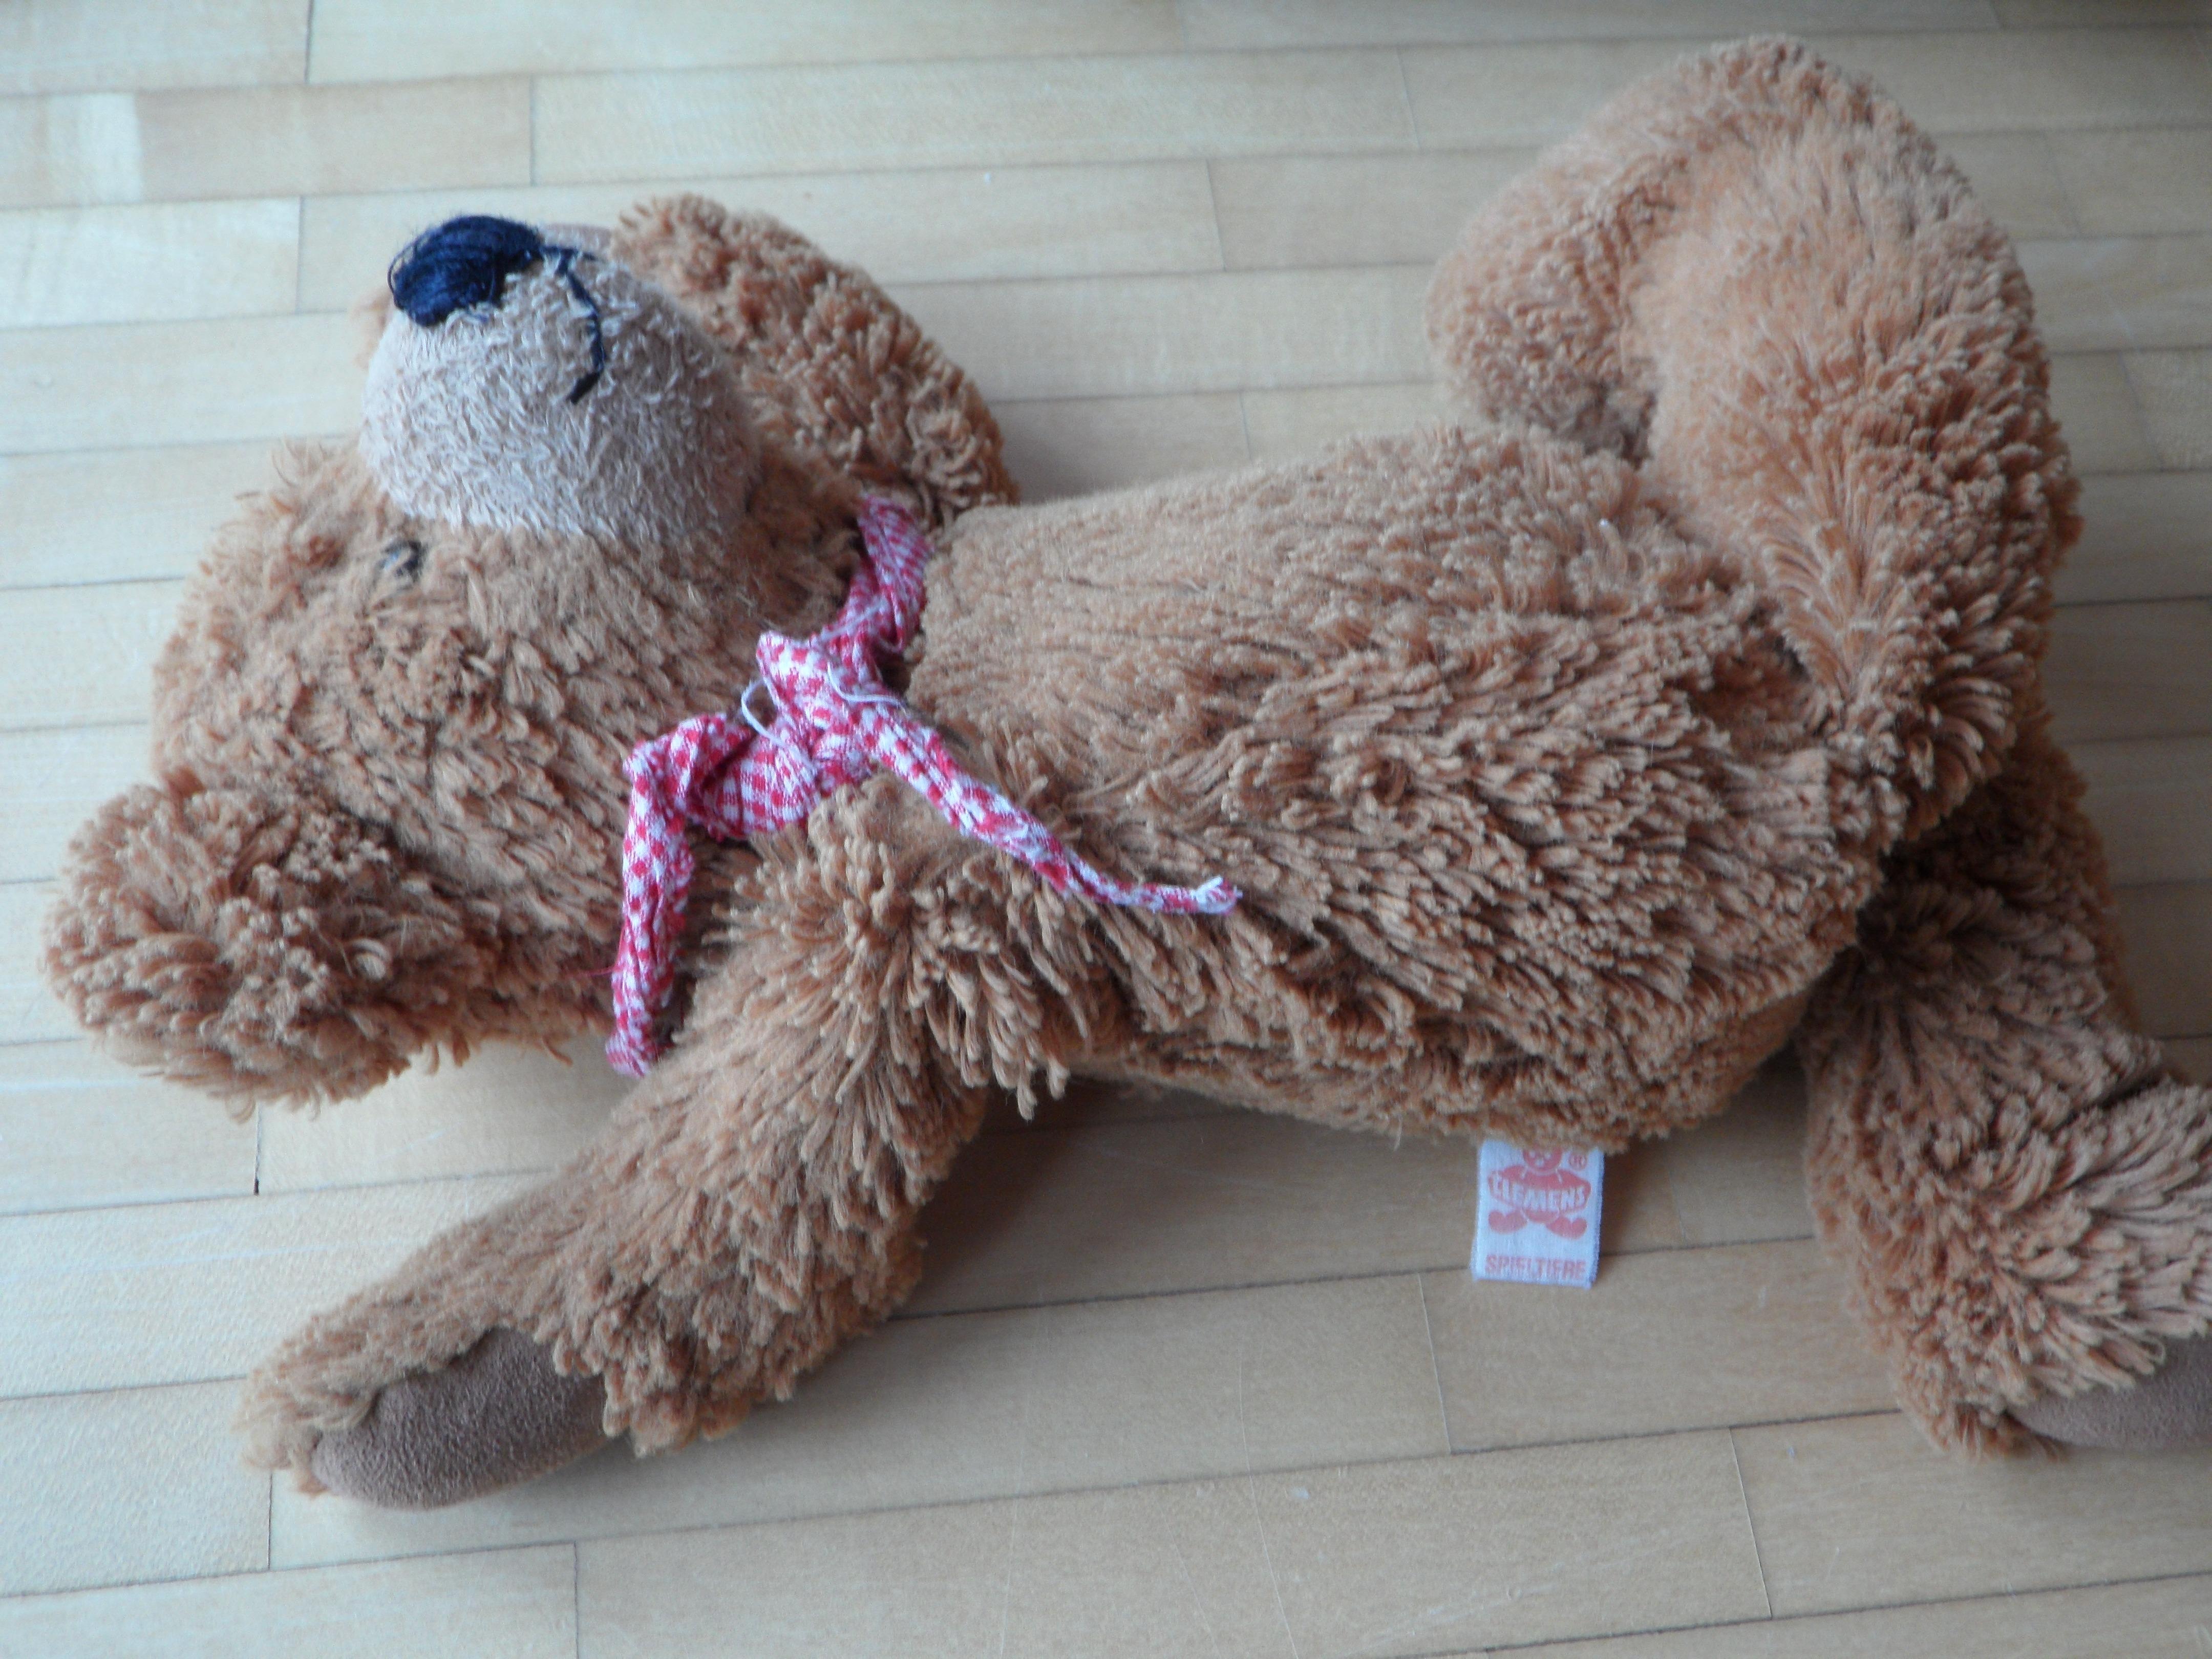 Fotos gratis : patrón, niño, solitario, juguete, material, oso de ...